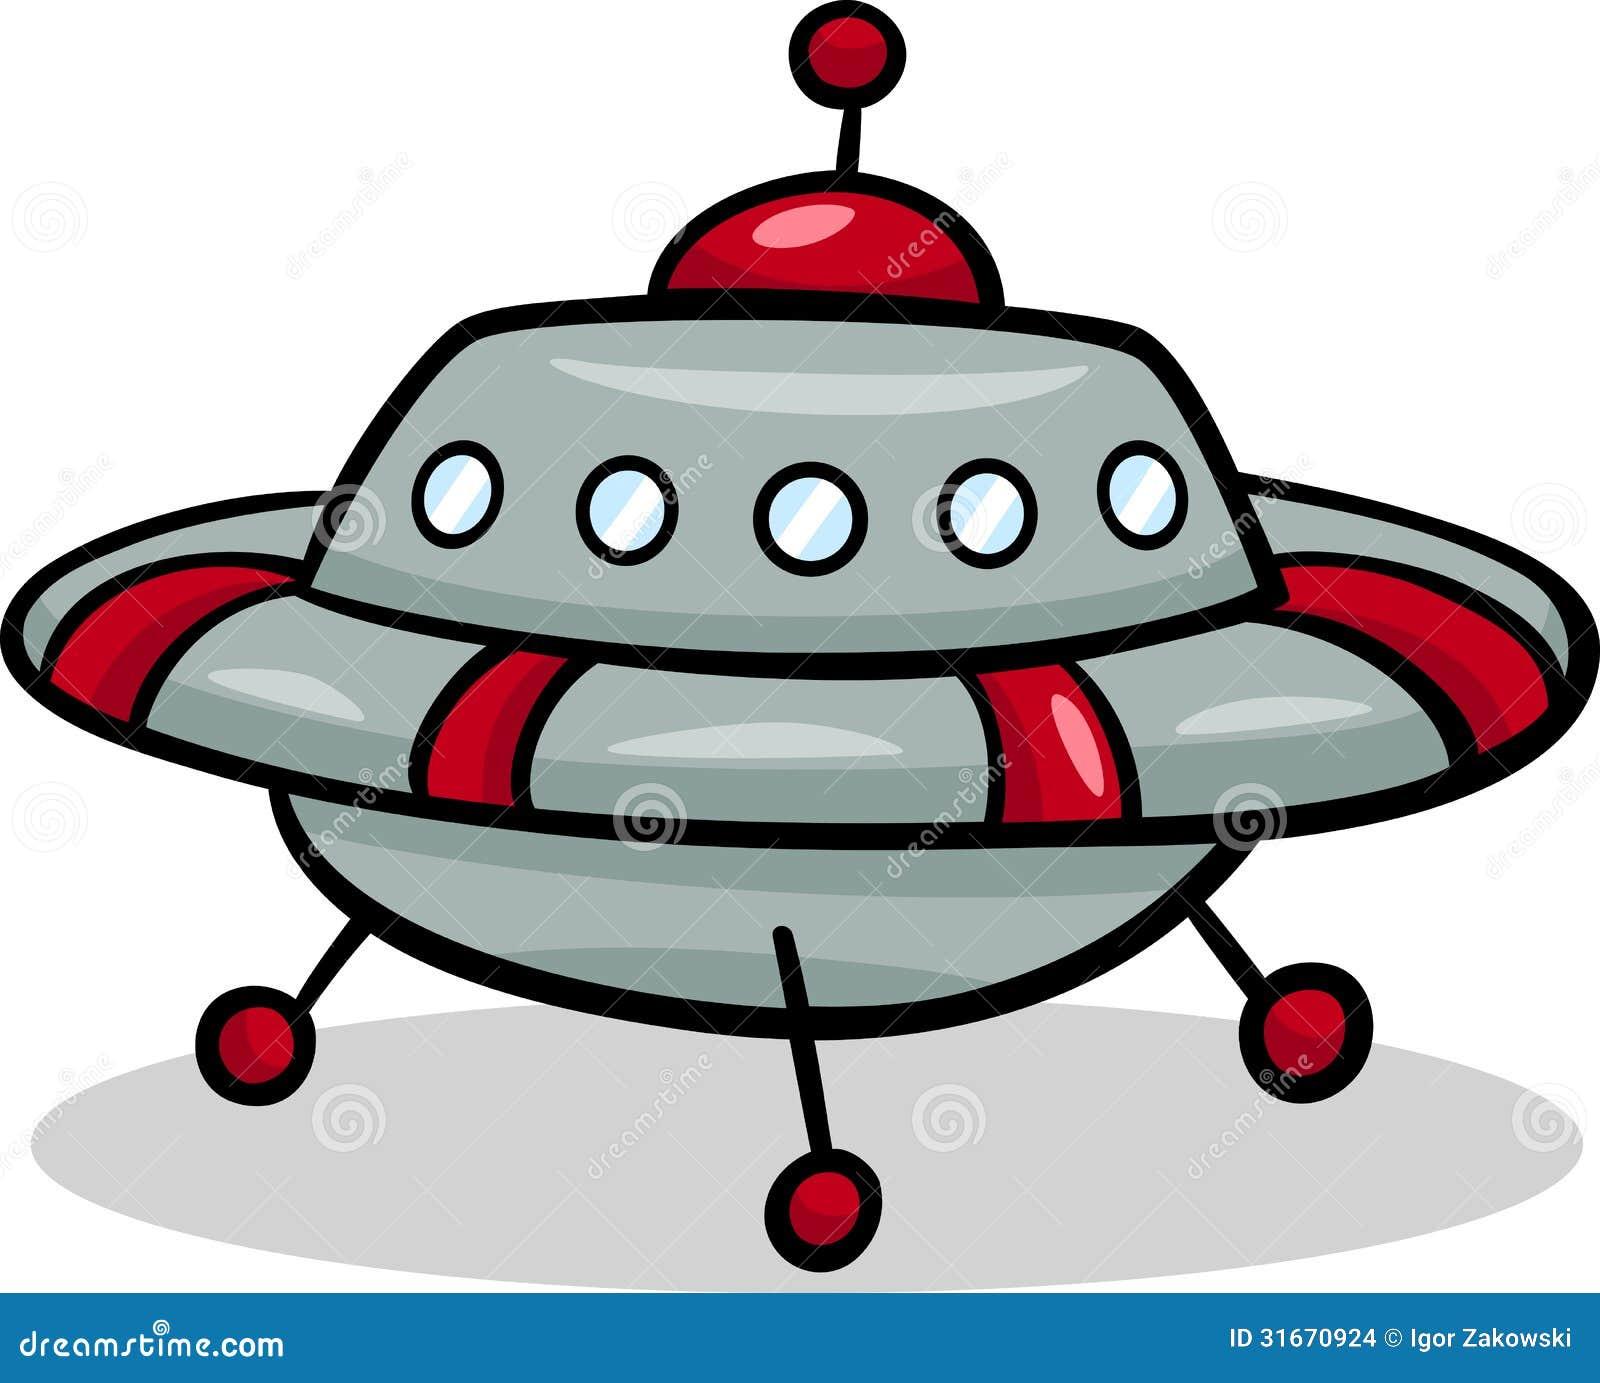 Alien Spaceship Clipart Free